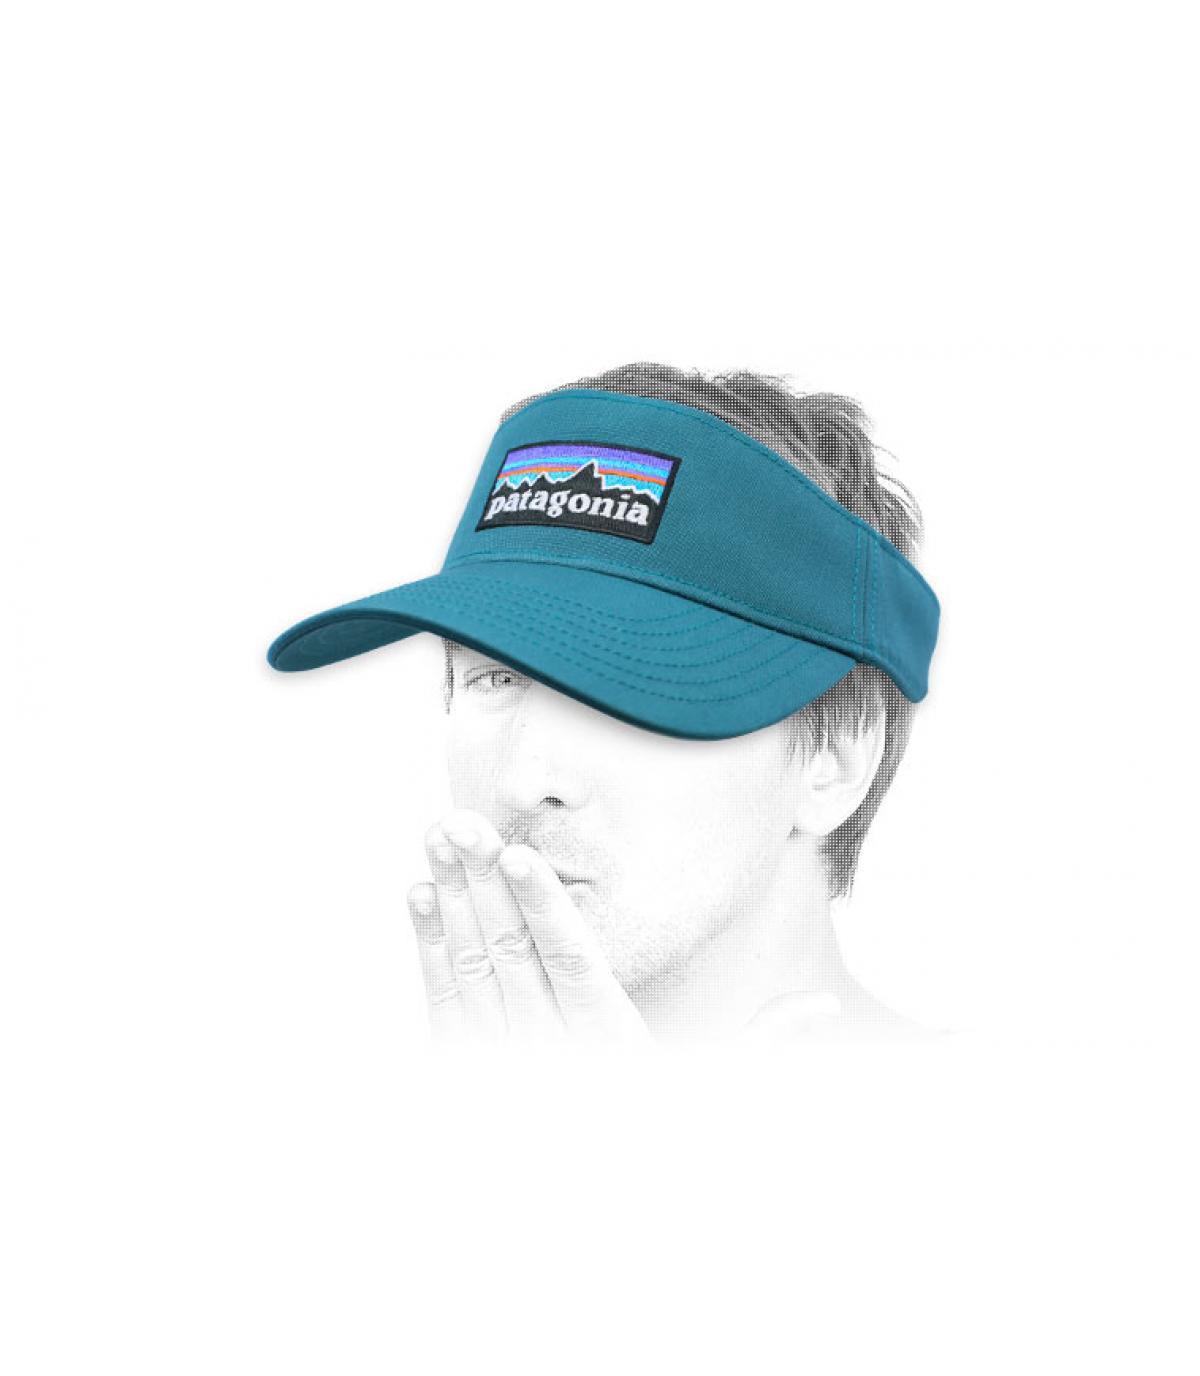 blue Patagonia visor